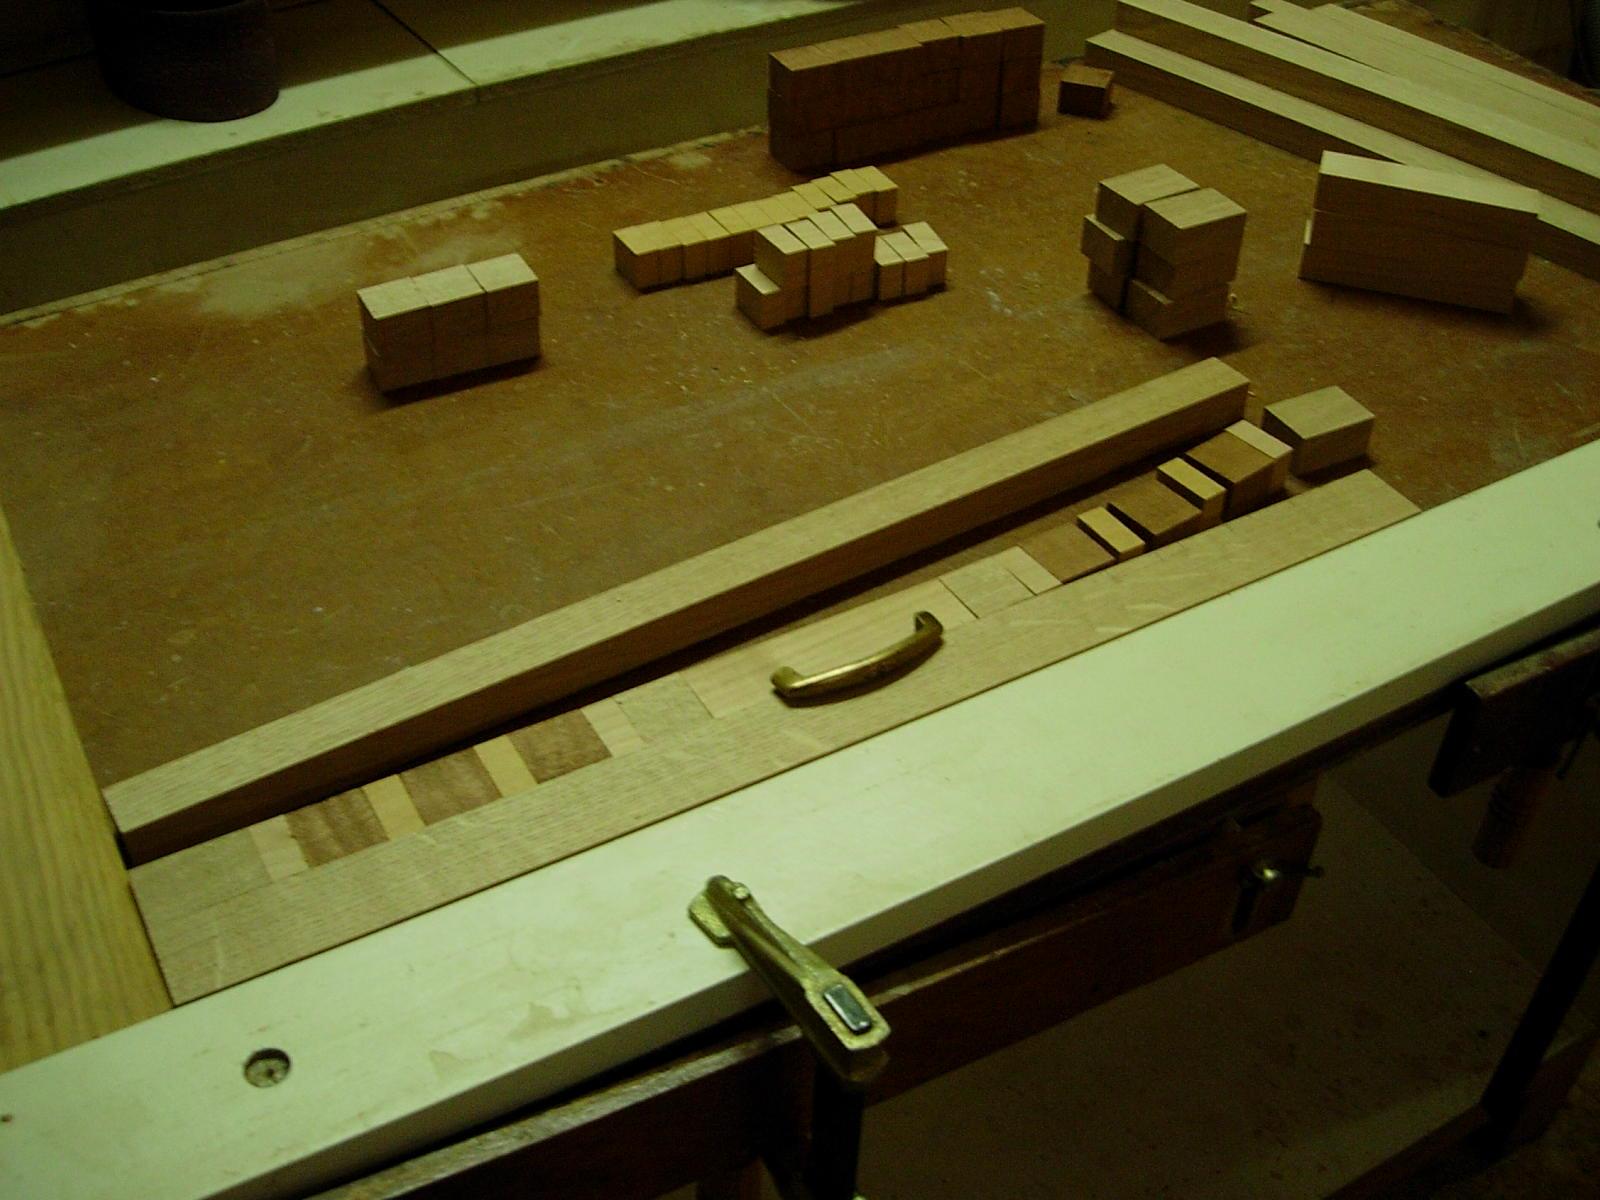 Sjuan ebanister a en madera en bilbao muebles artesanales for Muebles artesanales de madera